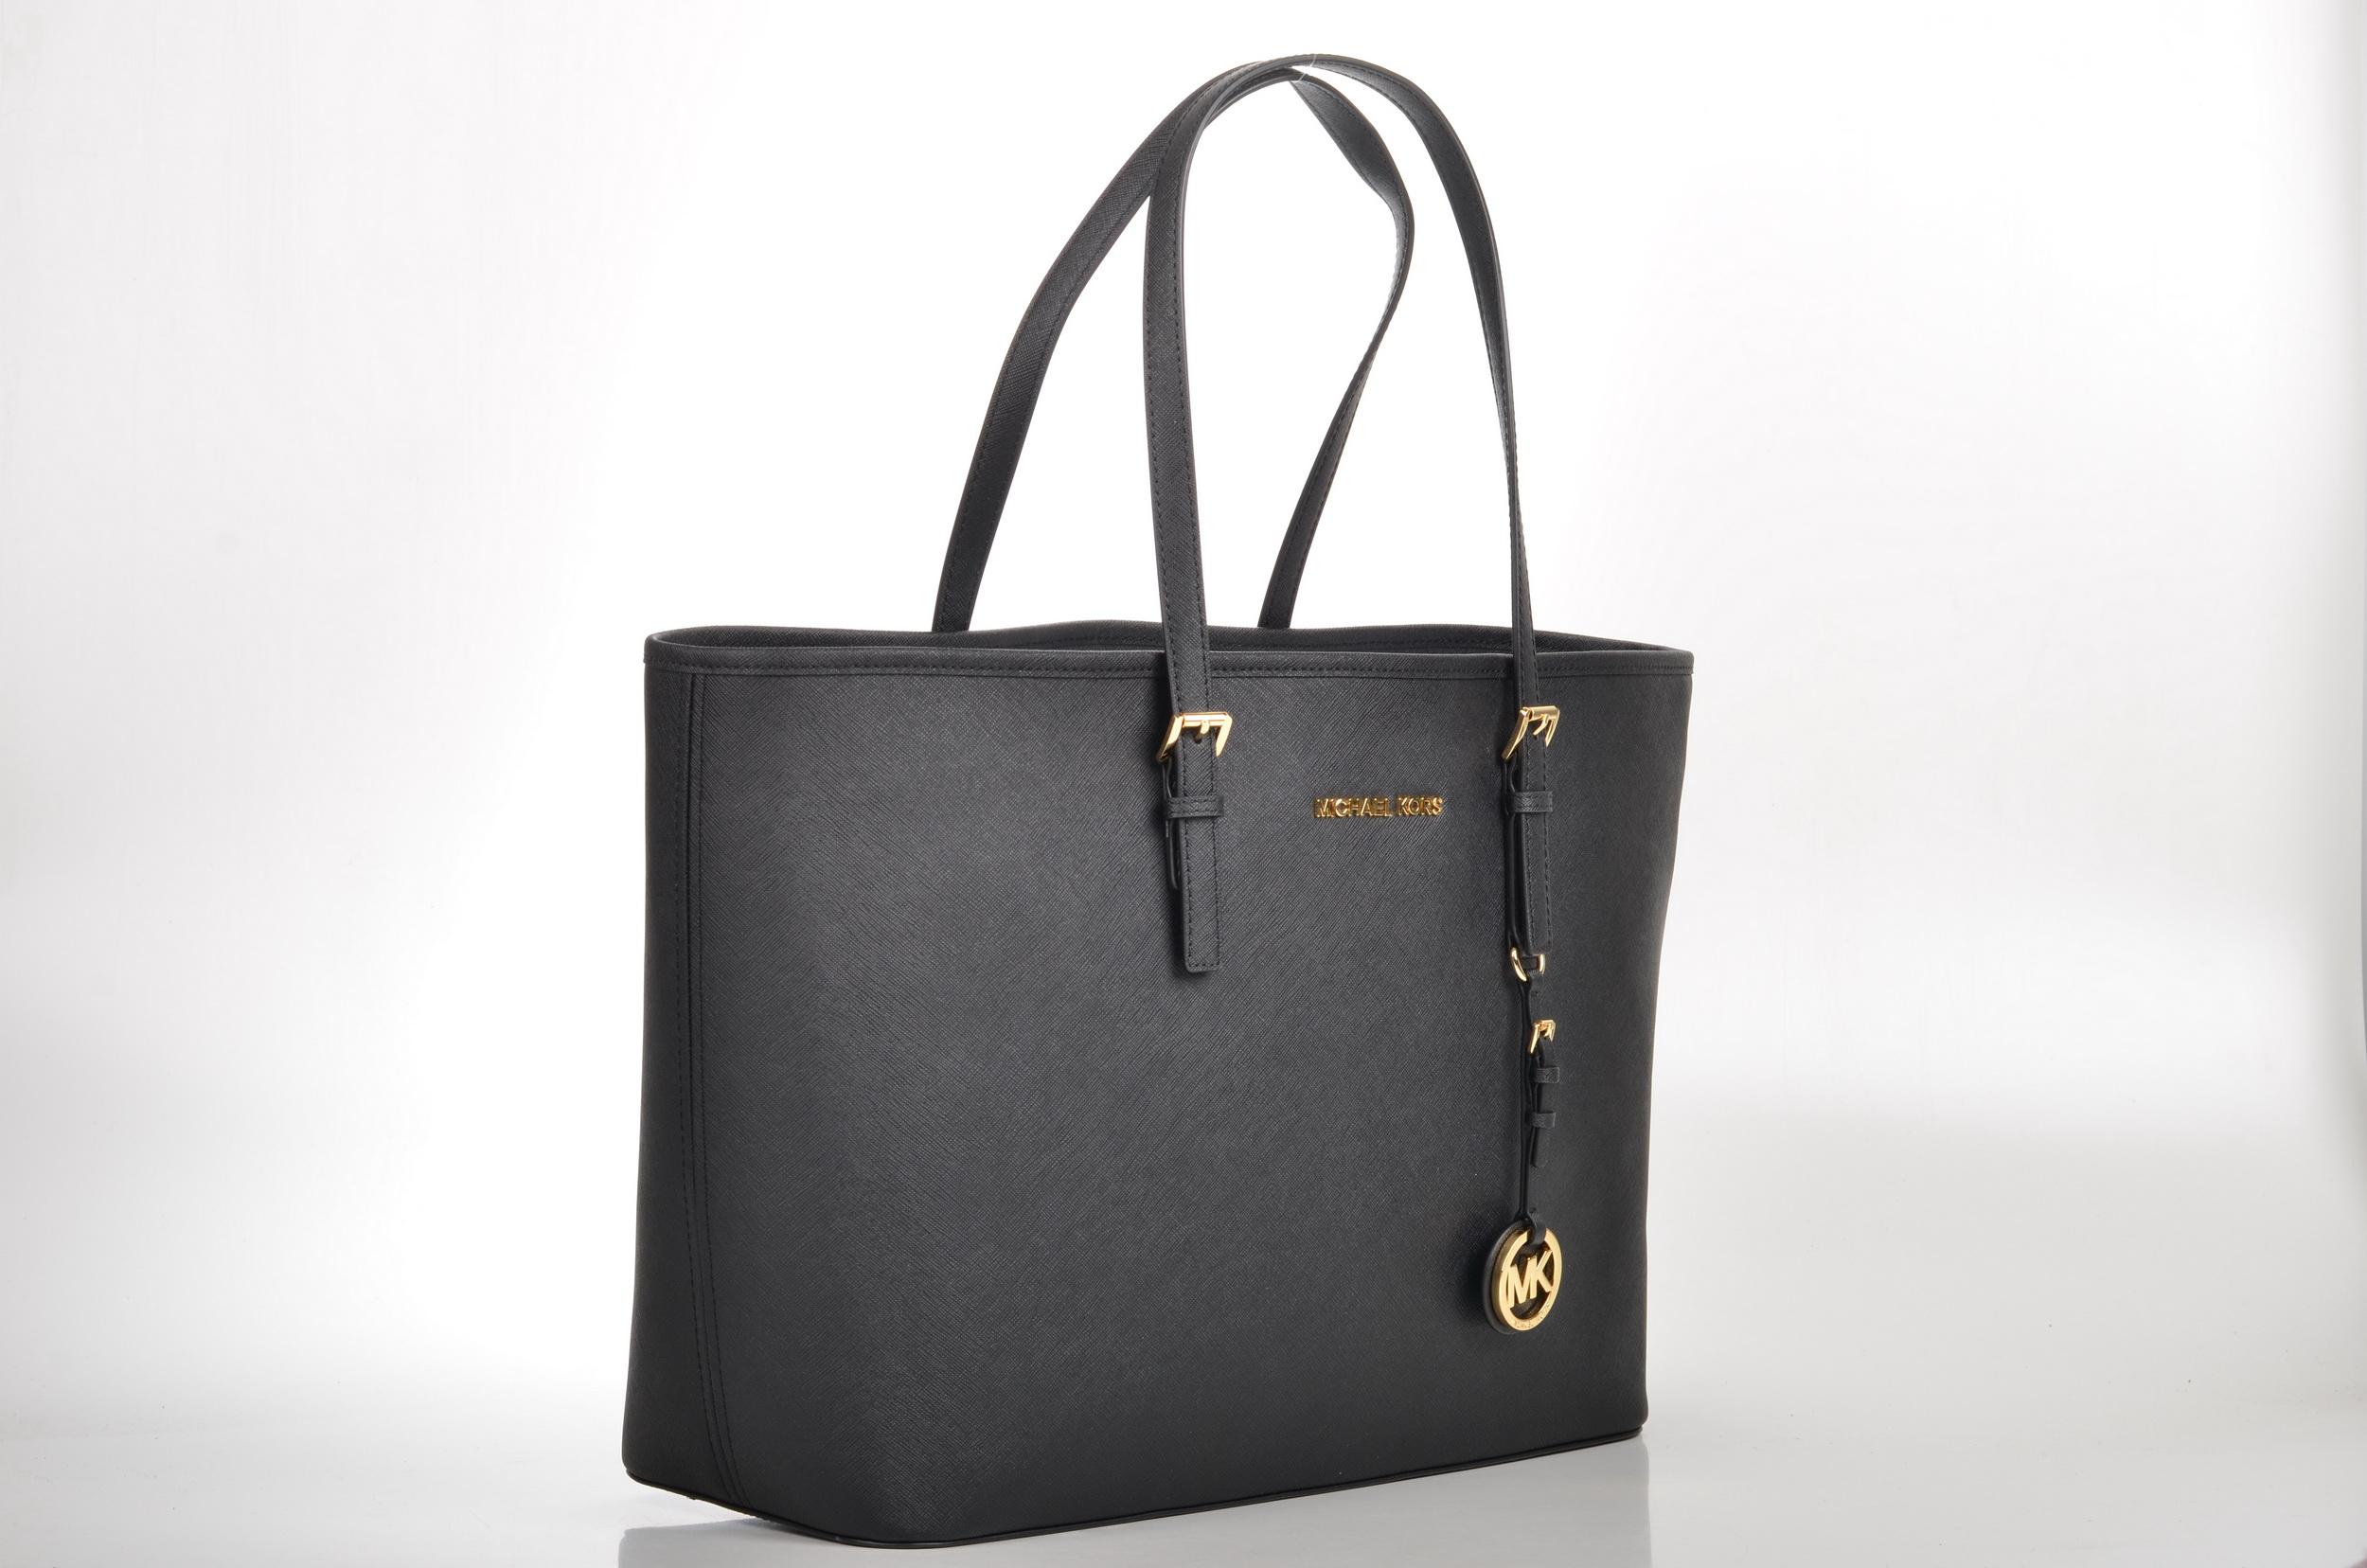 Michael Kors Shopping Haul | Jet Set Shopper in schwarz